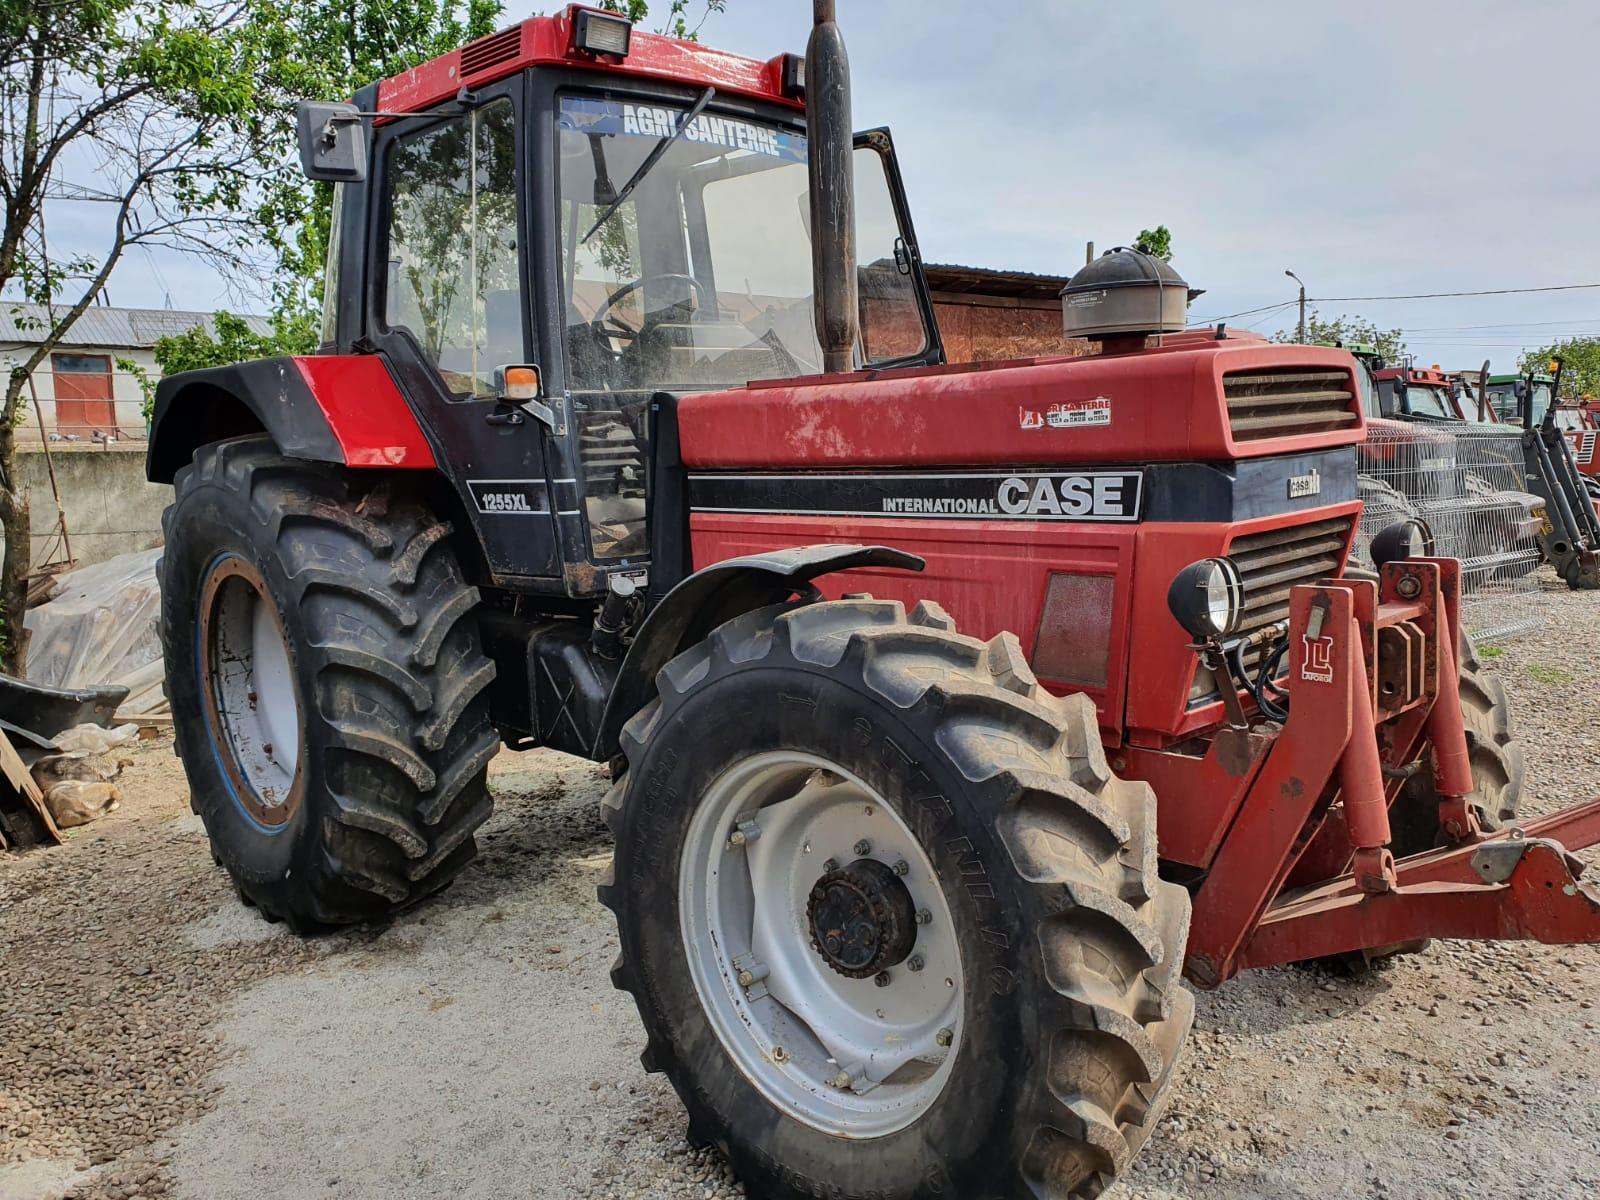 Tractor Case Internațional 1255 xl, tractiune mecanica 4×4, anvelope aproape noi, 125 CP